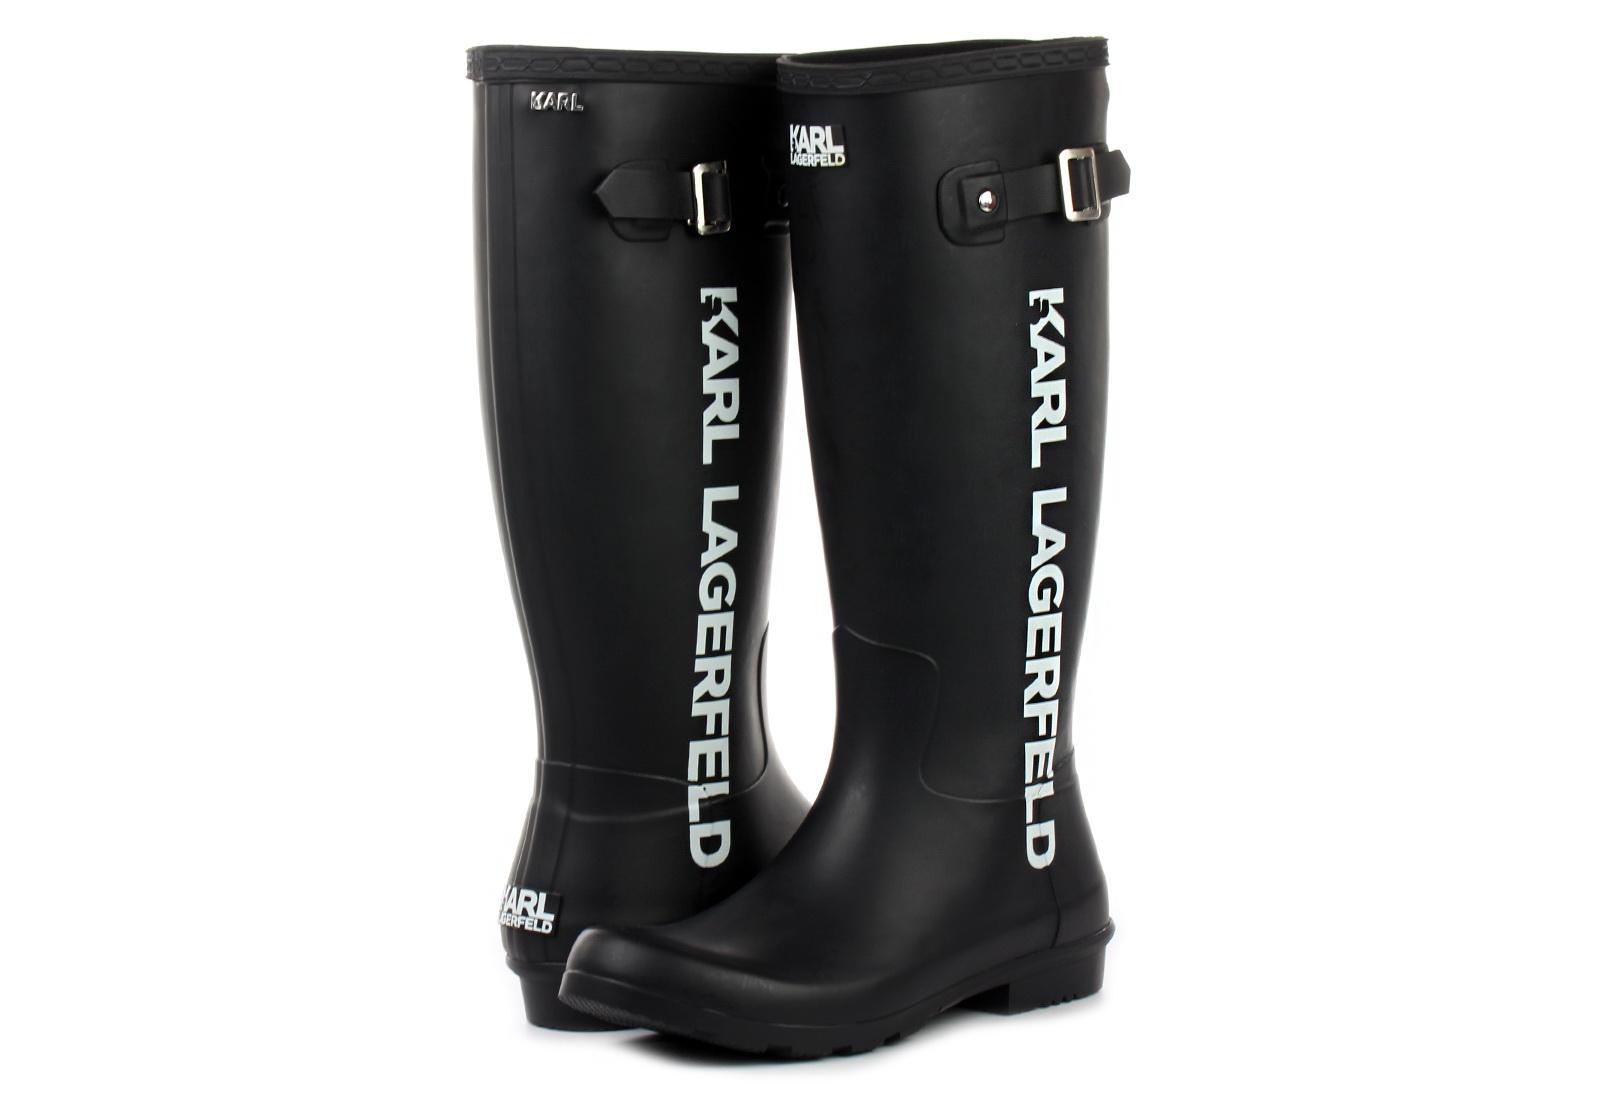 Karl Lagerfeld Cizme Kalosh Karl Band Boot